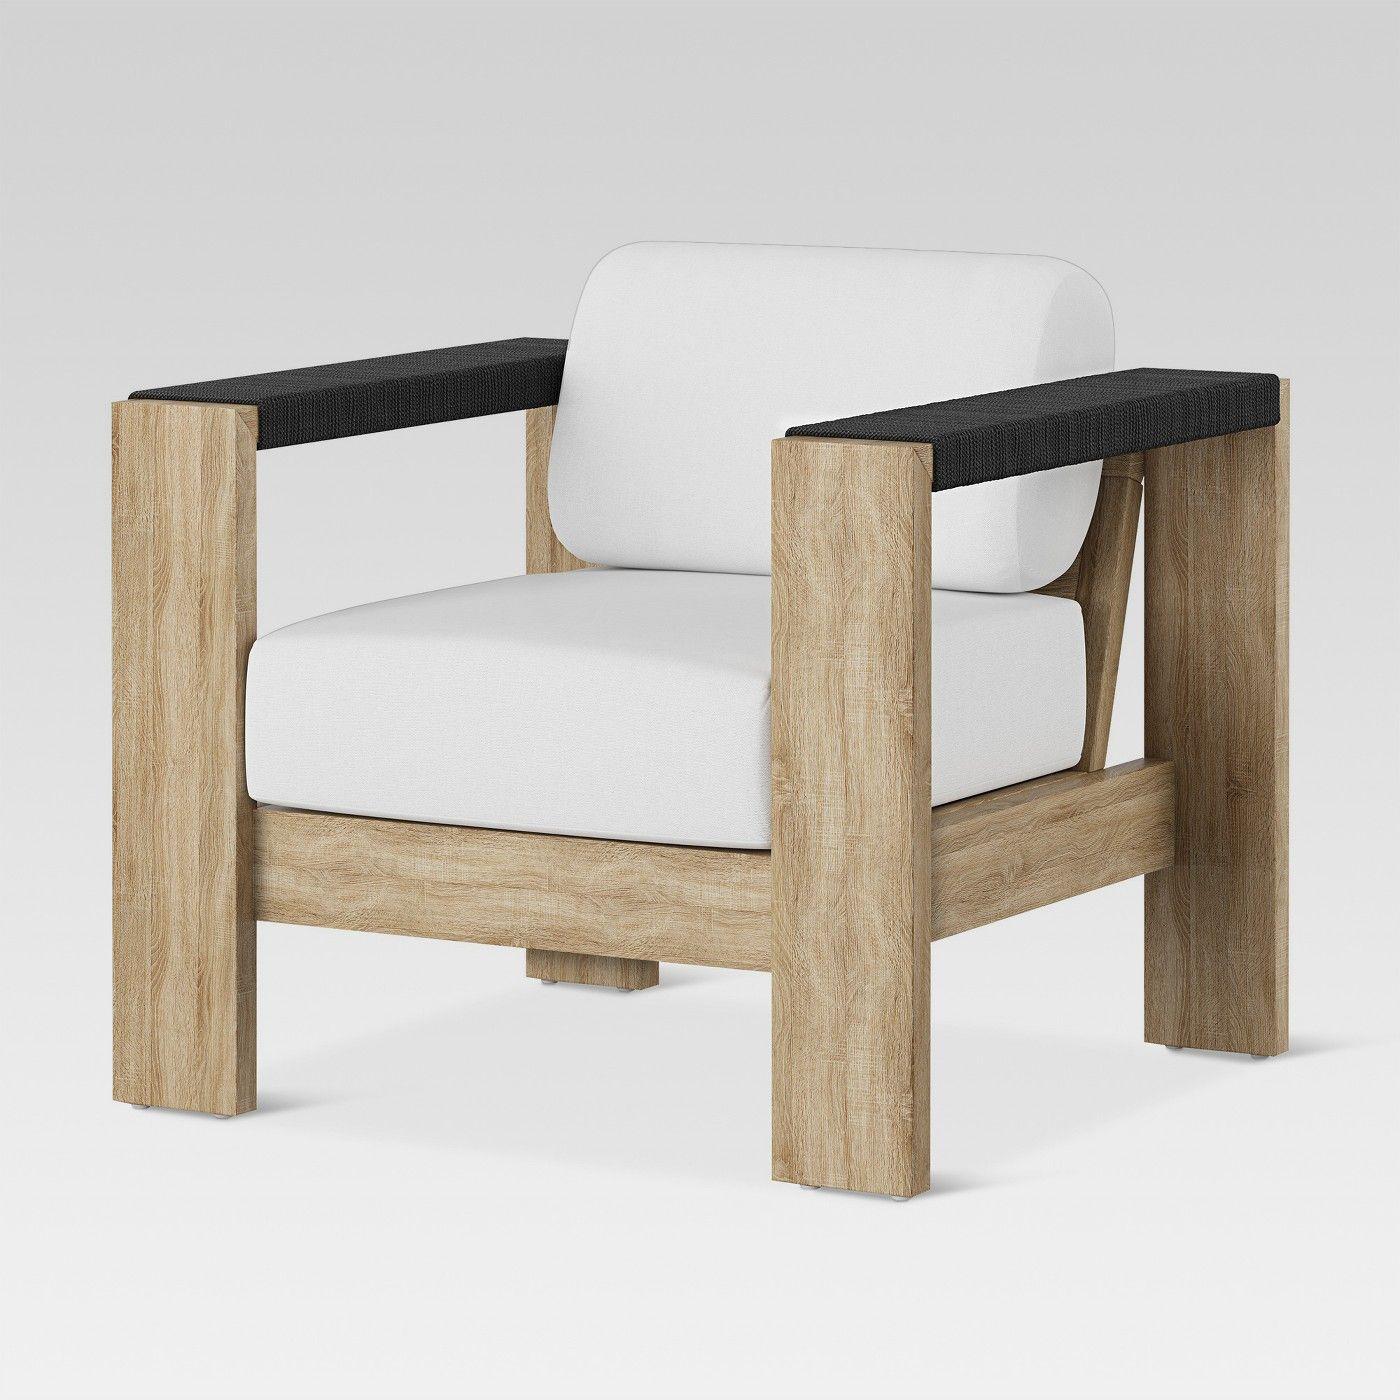 Montpelier Wood Patio Club Chair with Sunbrella Fabric